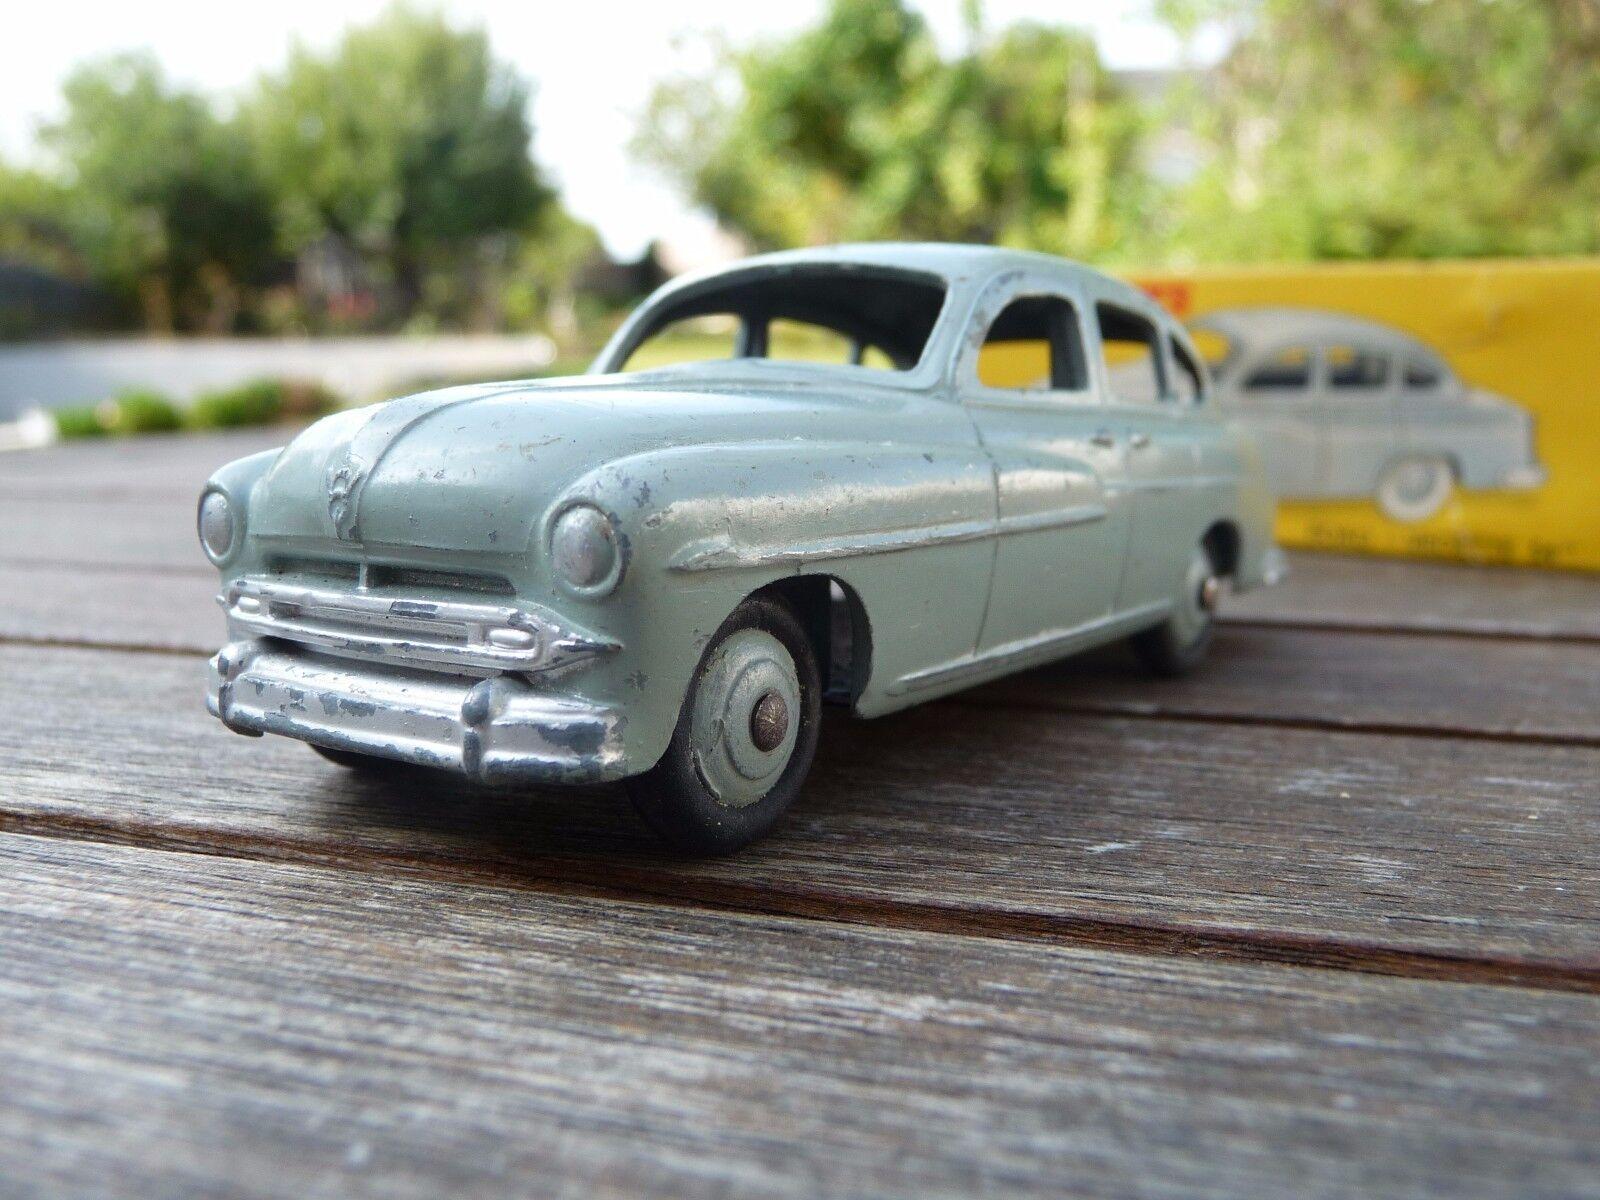 SUPERBE   DINKY TOYS FORD VEDETTE modèle 1954 REF 24X  + boite